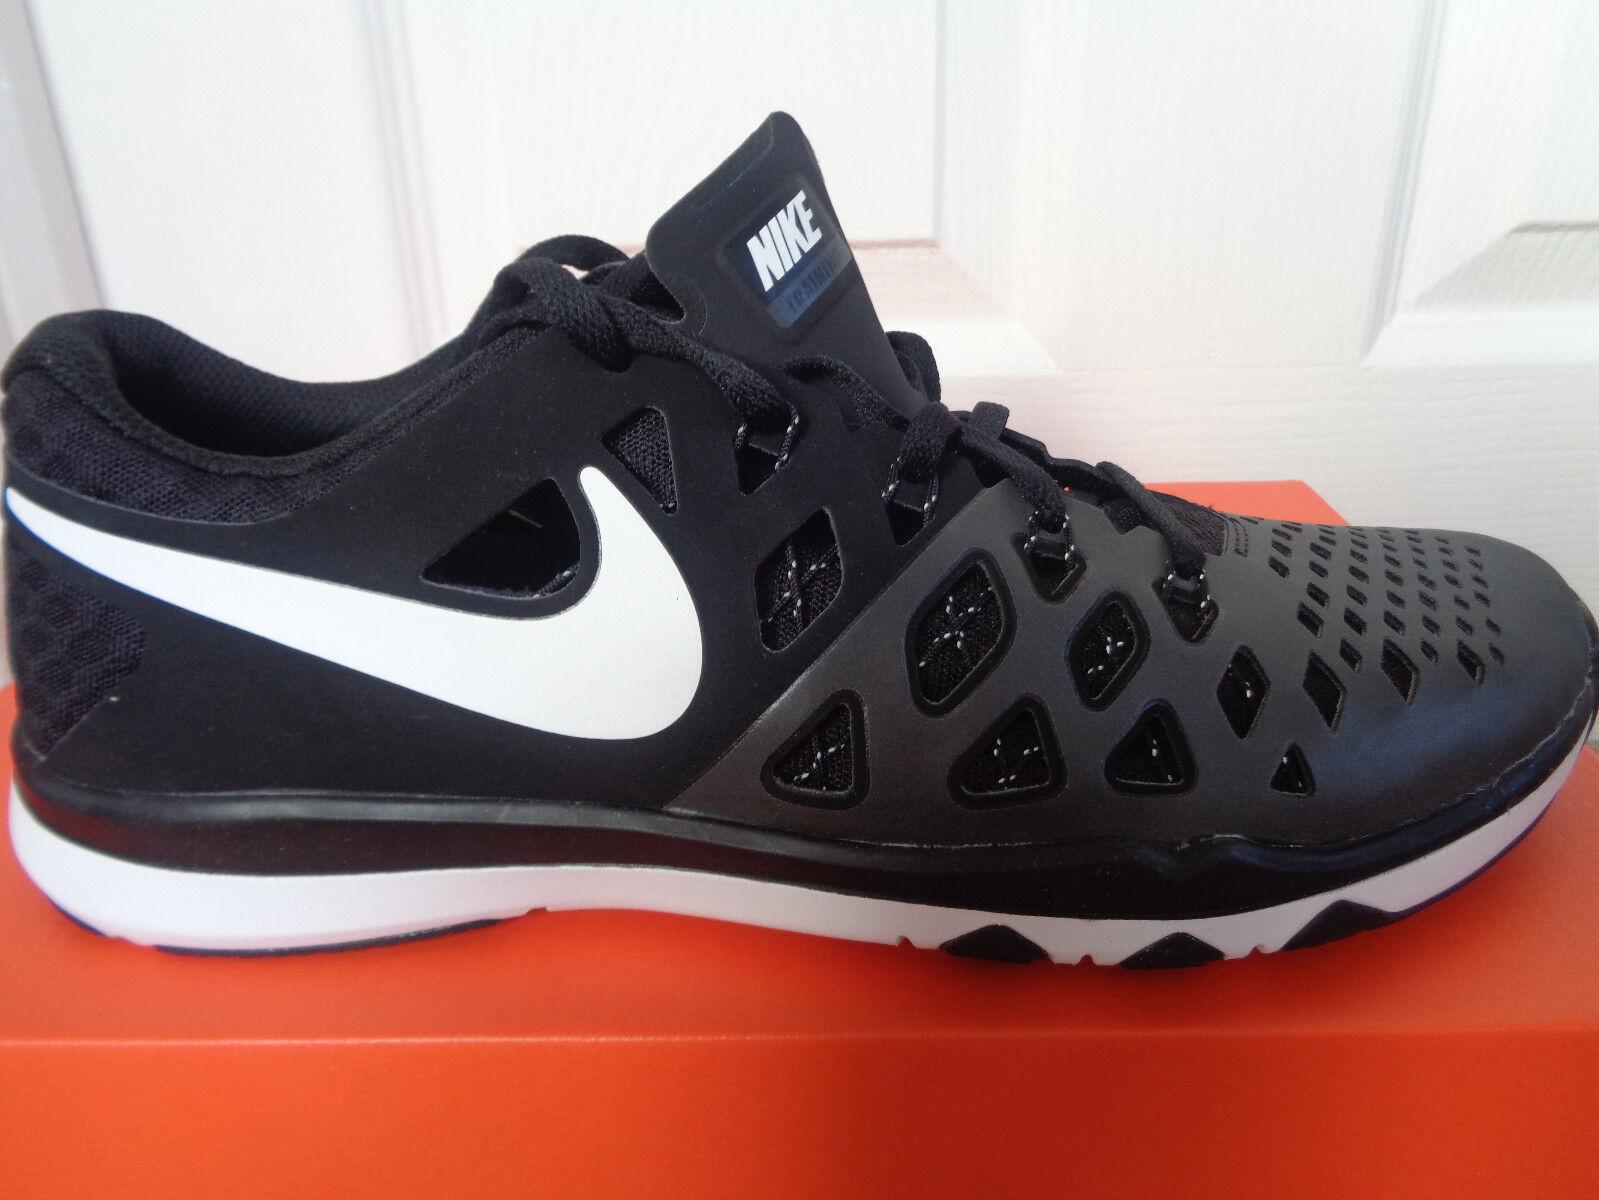 Nike Train 4  Uomo Speed   Da Da Da Ginnastica 843937 010 EU 42.5   9 Nuovo + Scatola ea4bfc